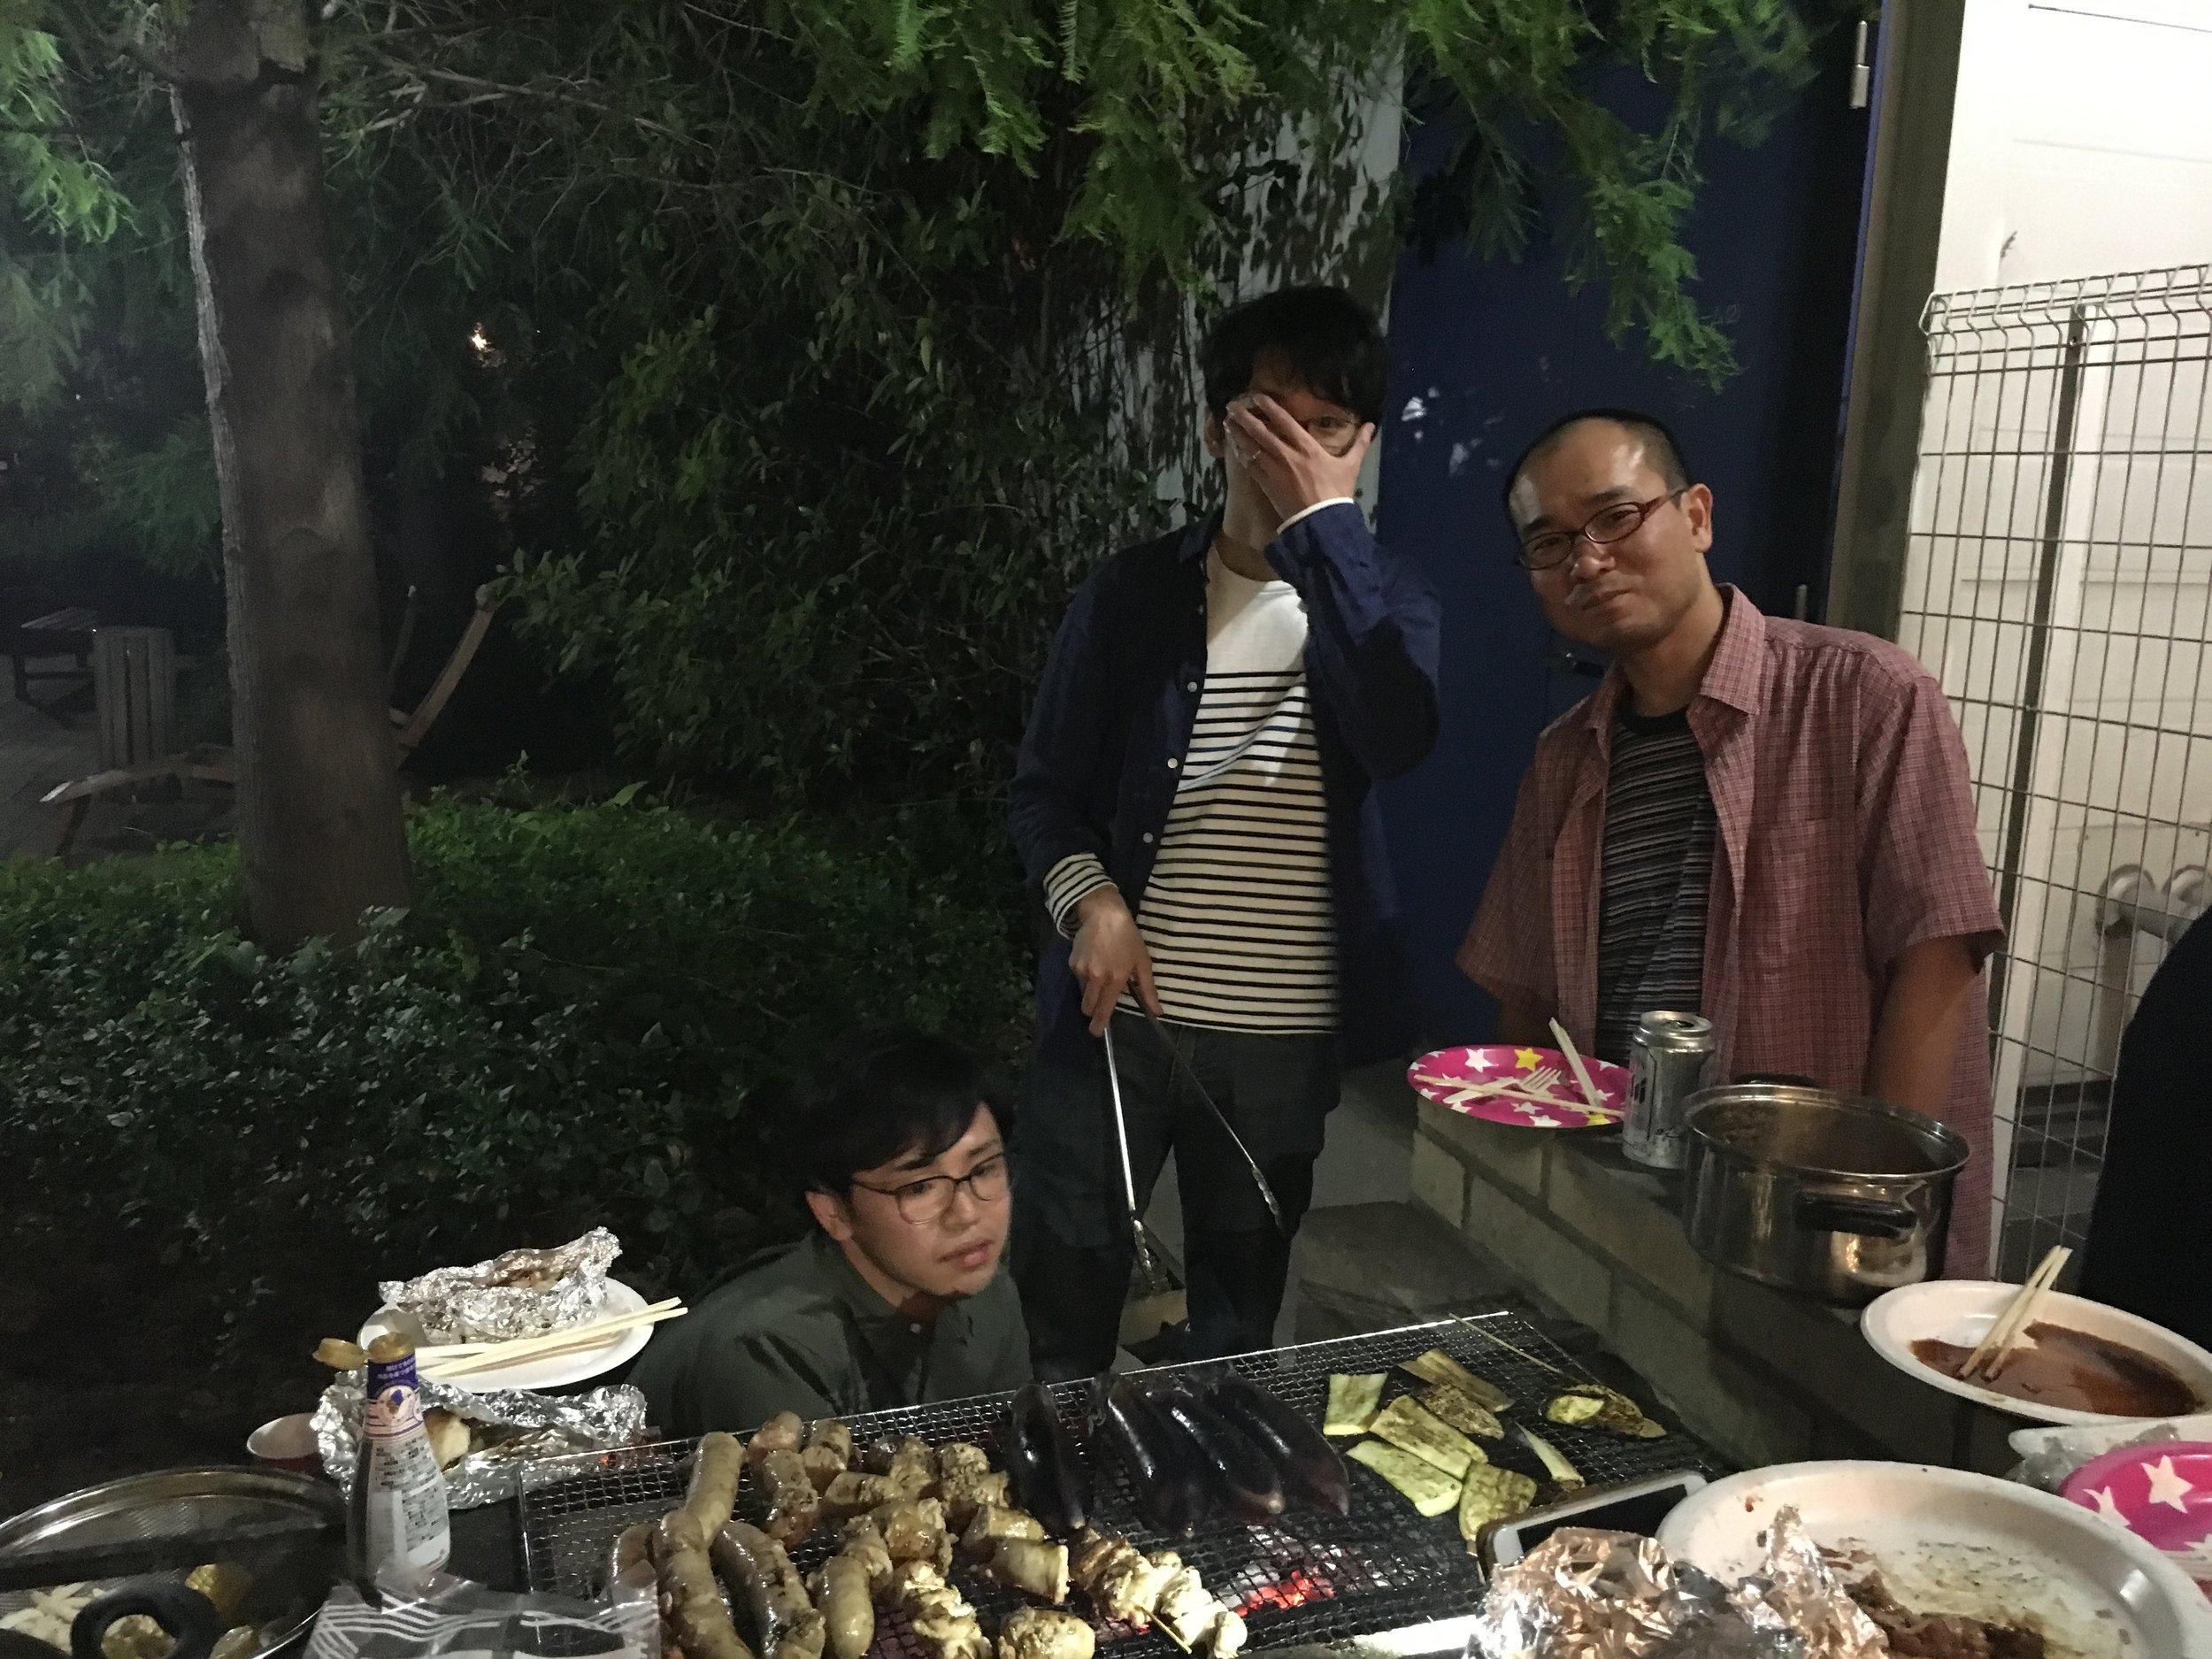 Photo 2017-06-09 20 07 24.jpg